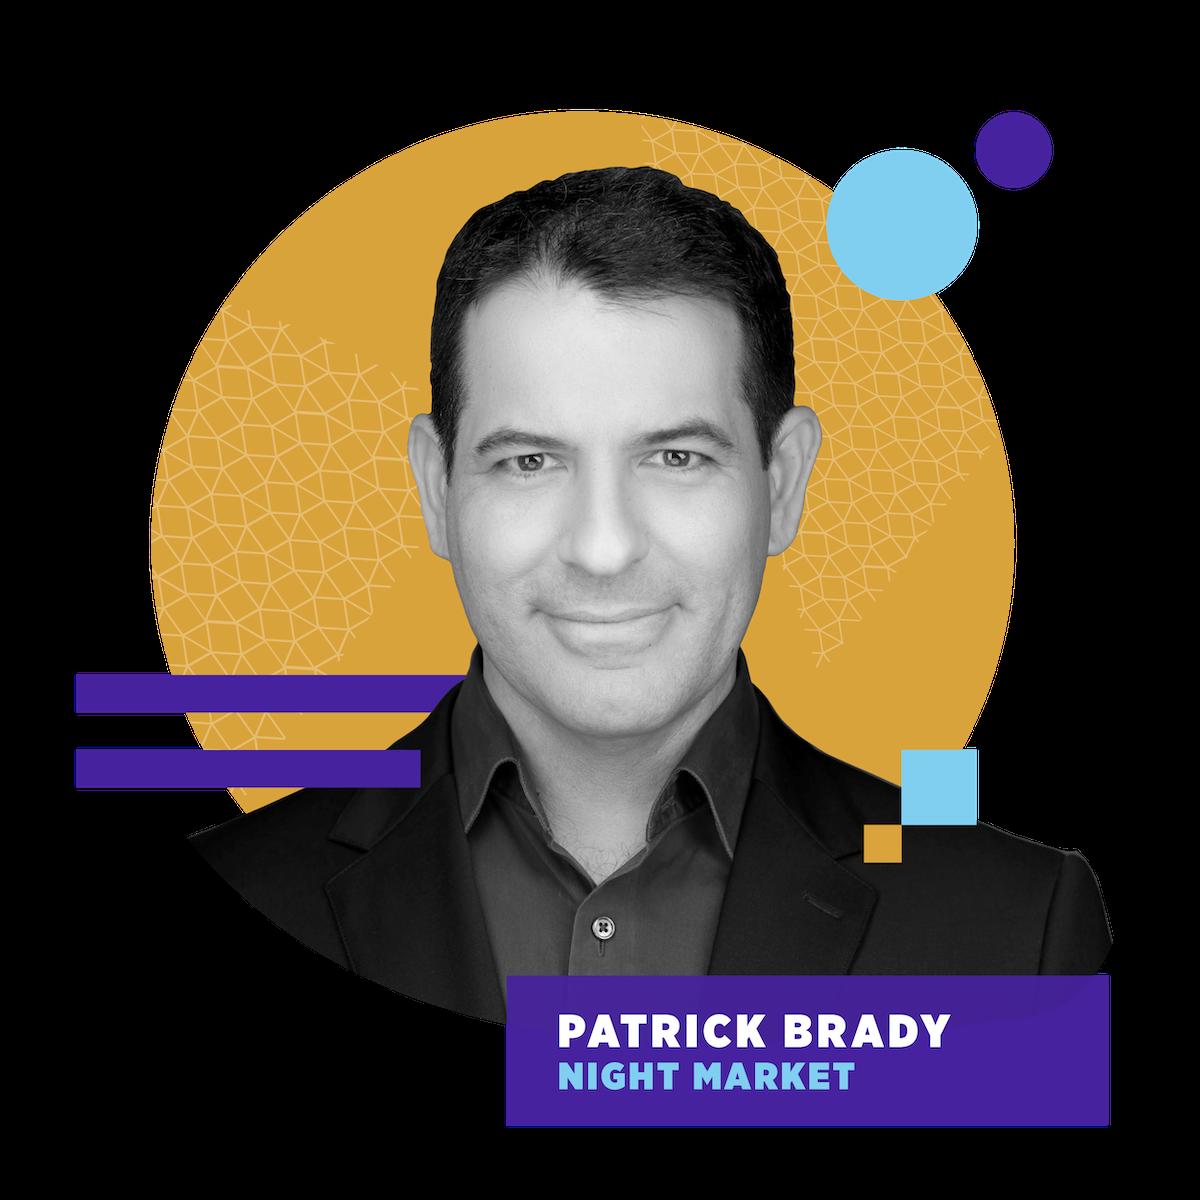 Patrick Brady